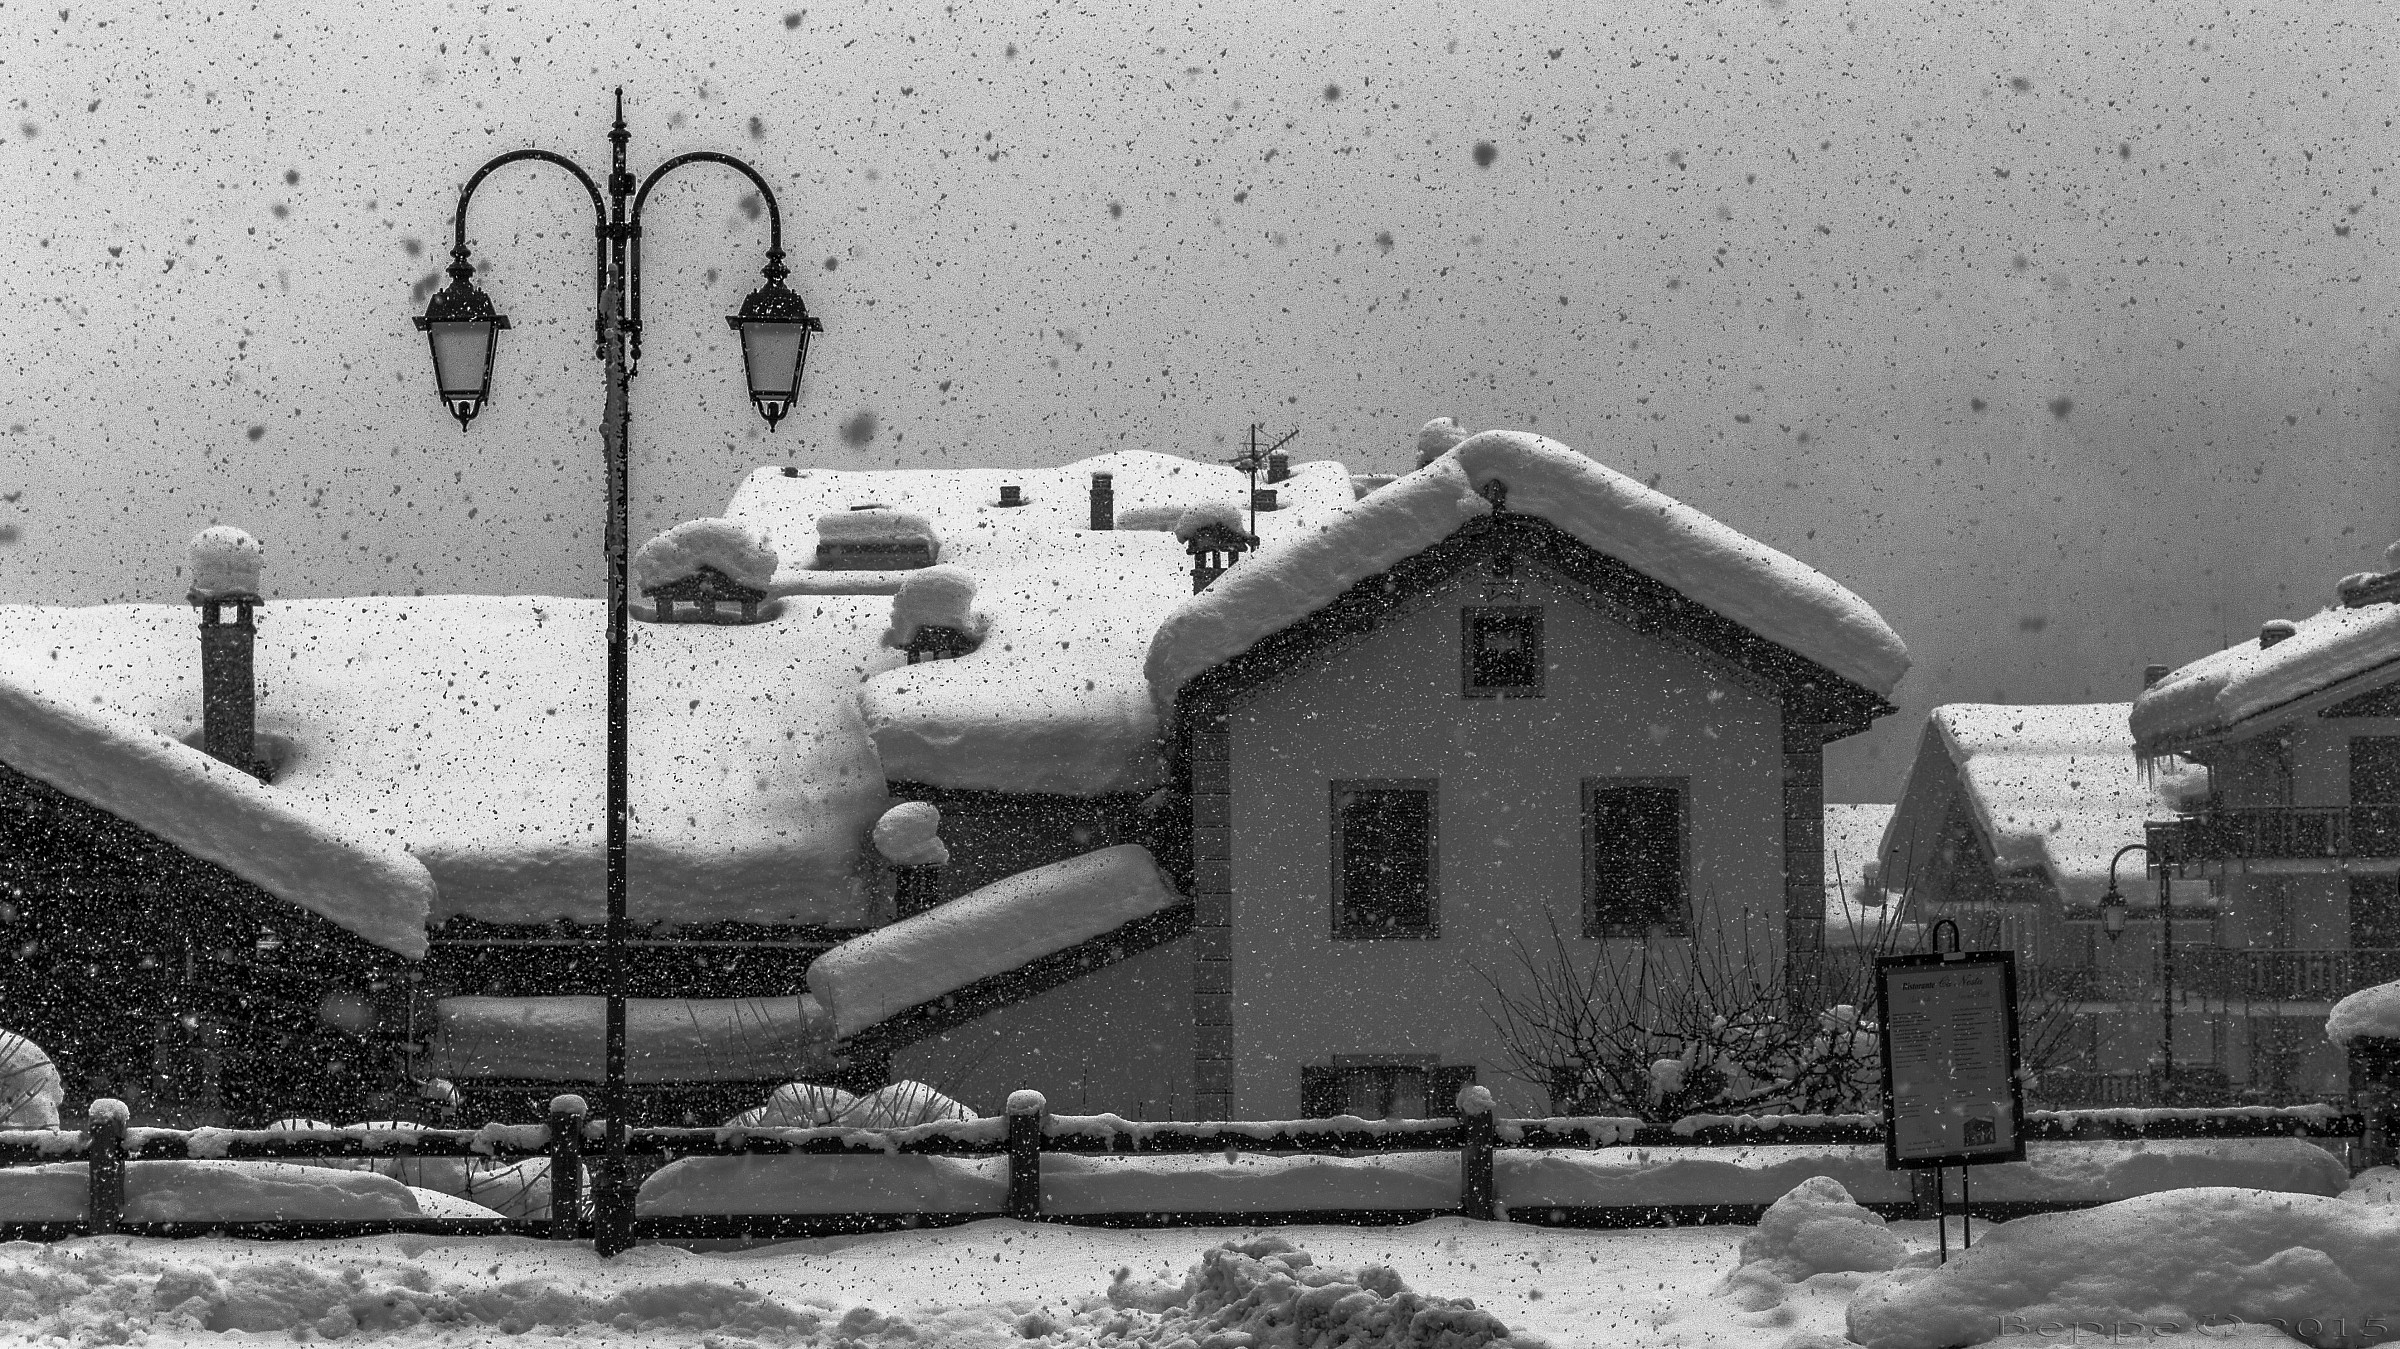 Snow as handkerchiefs...